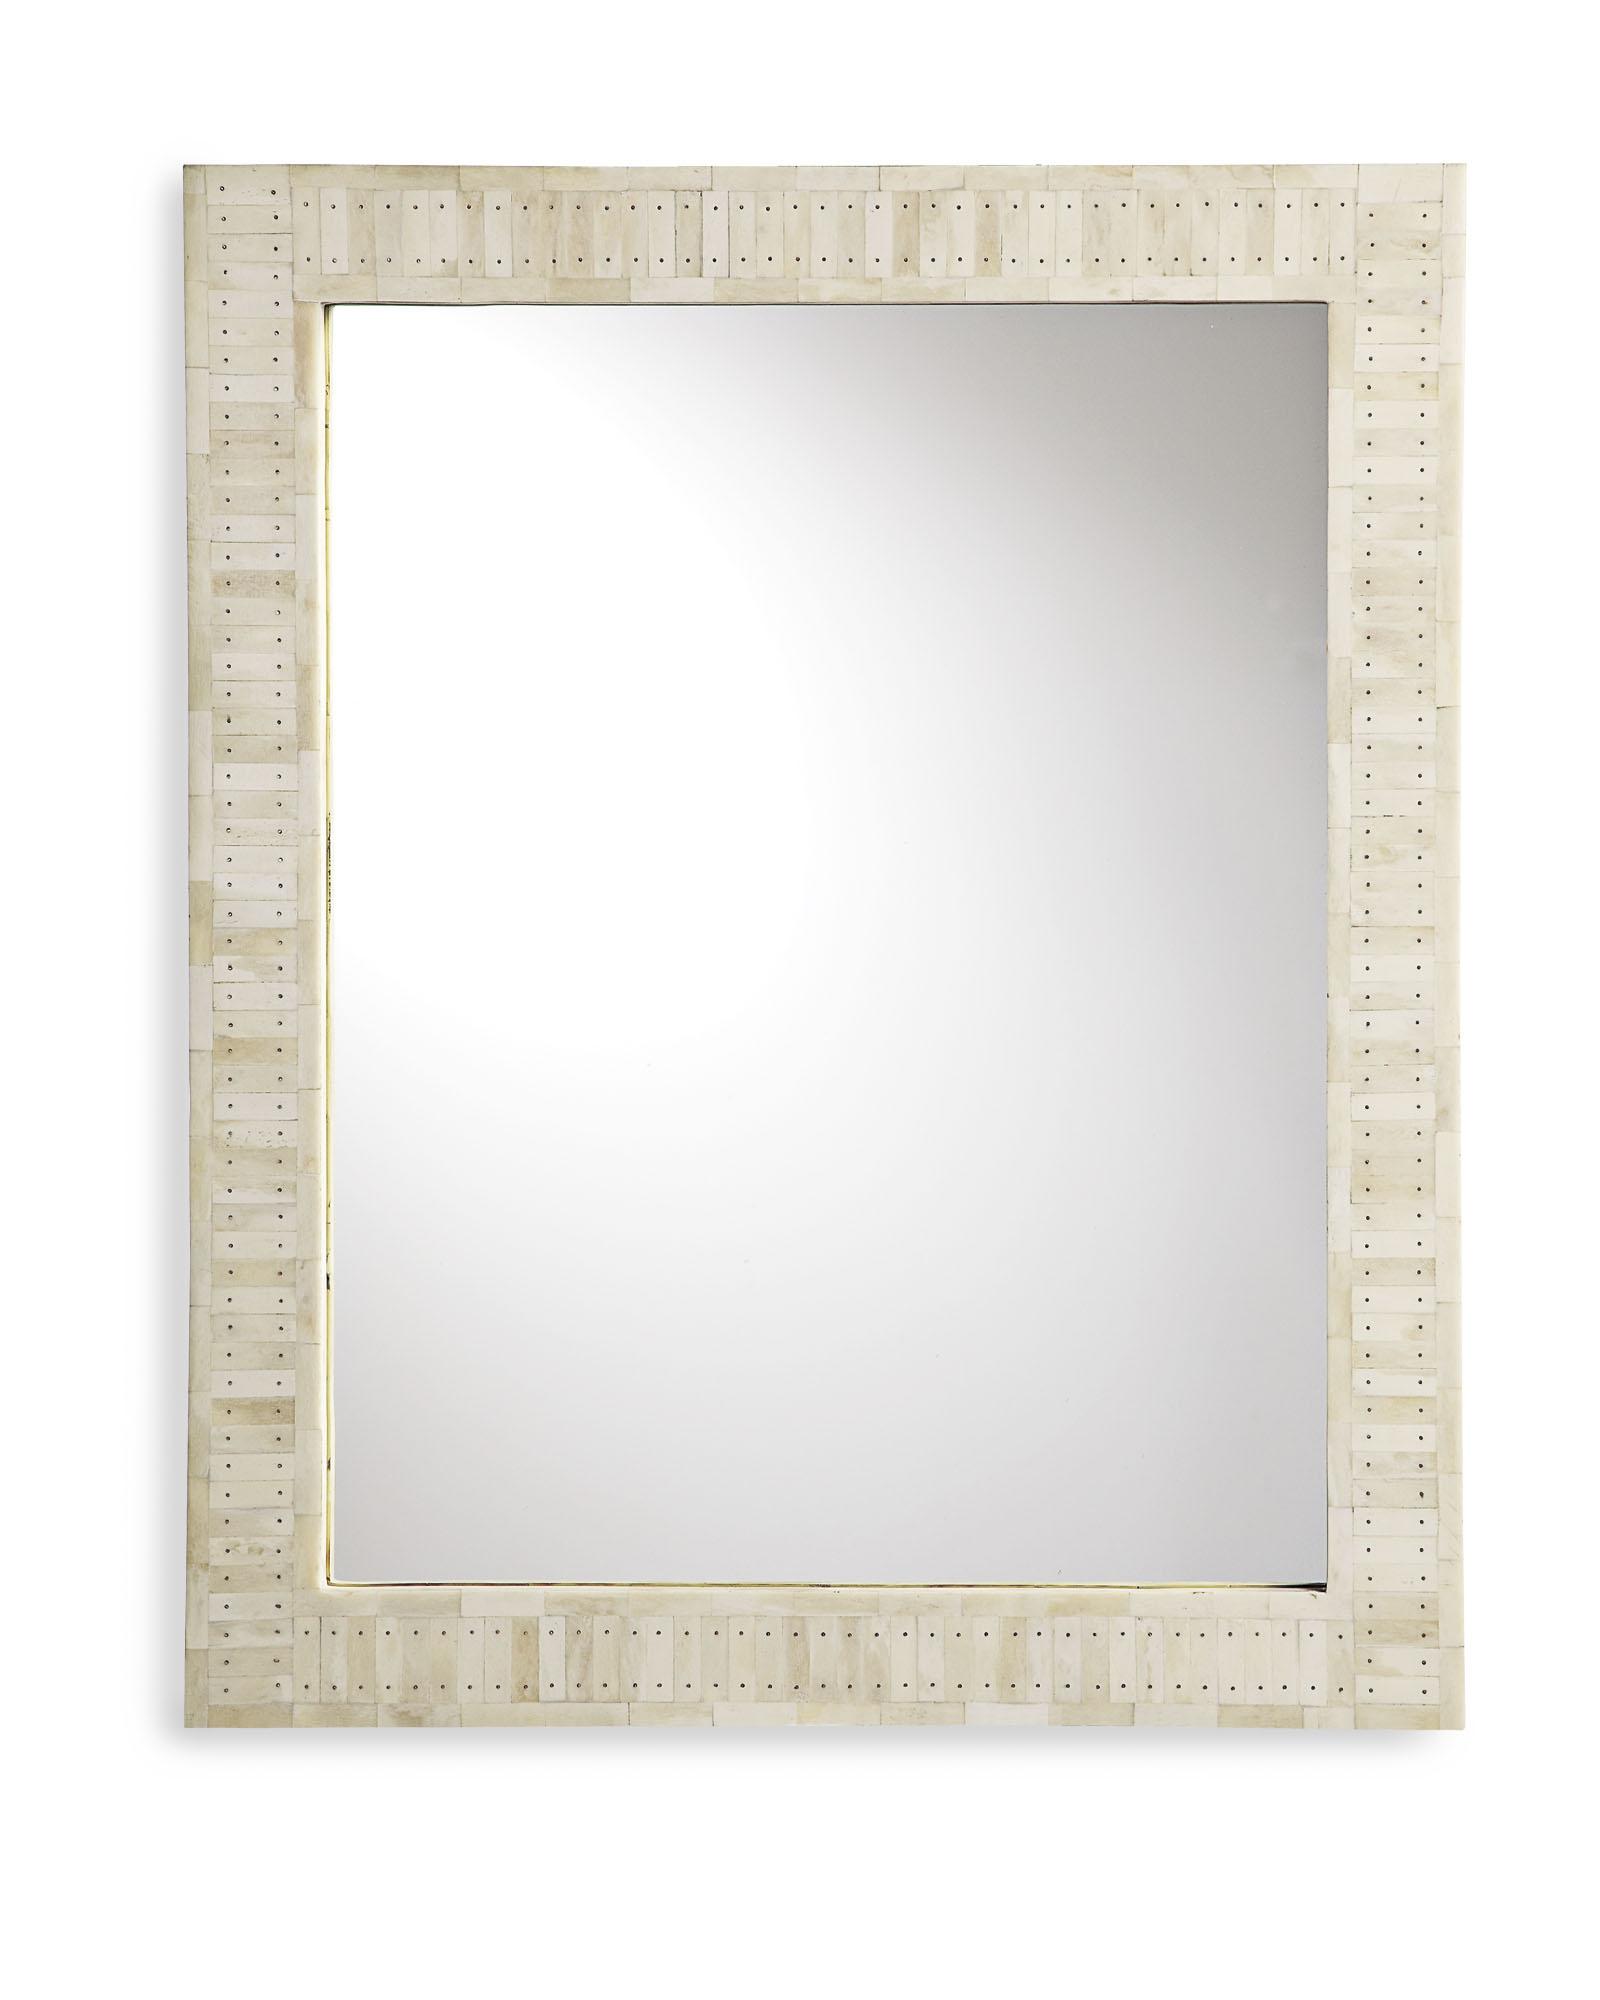 Parsons Wall Mirror Bone Inlay • Bathroom Mirrors And Wall Mirrors For Latest Parsons Wall Mirrors (View 1 of 20)